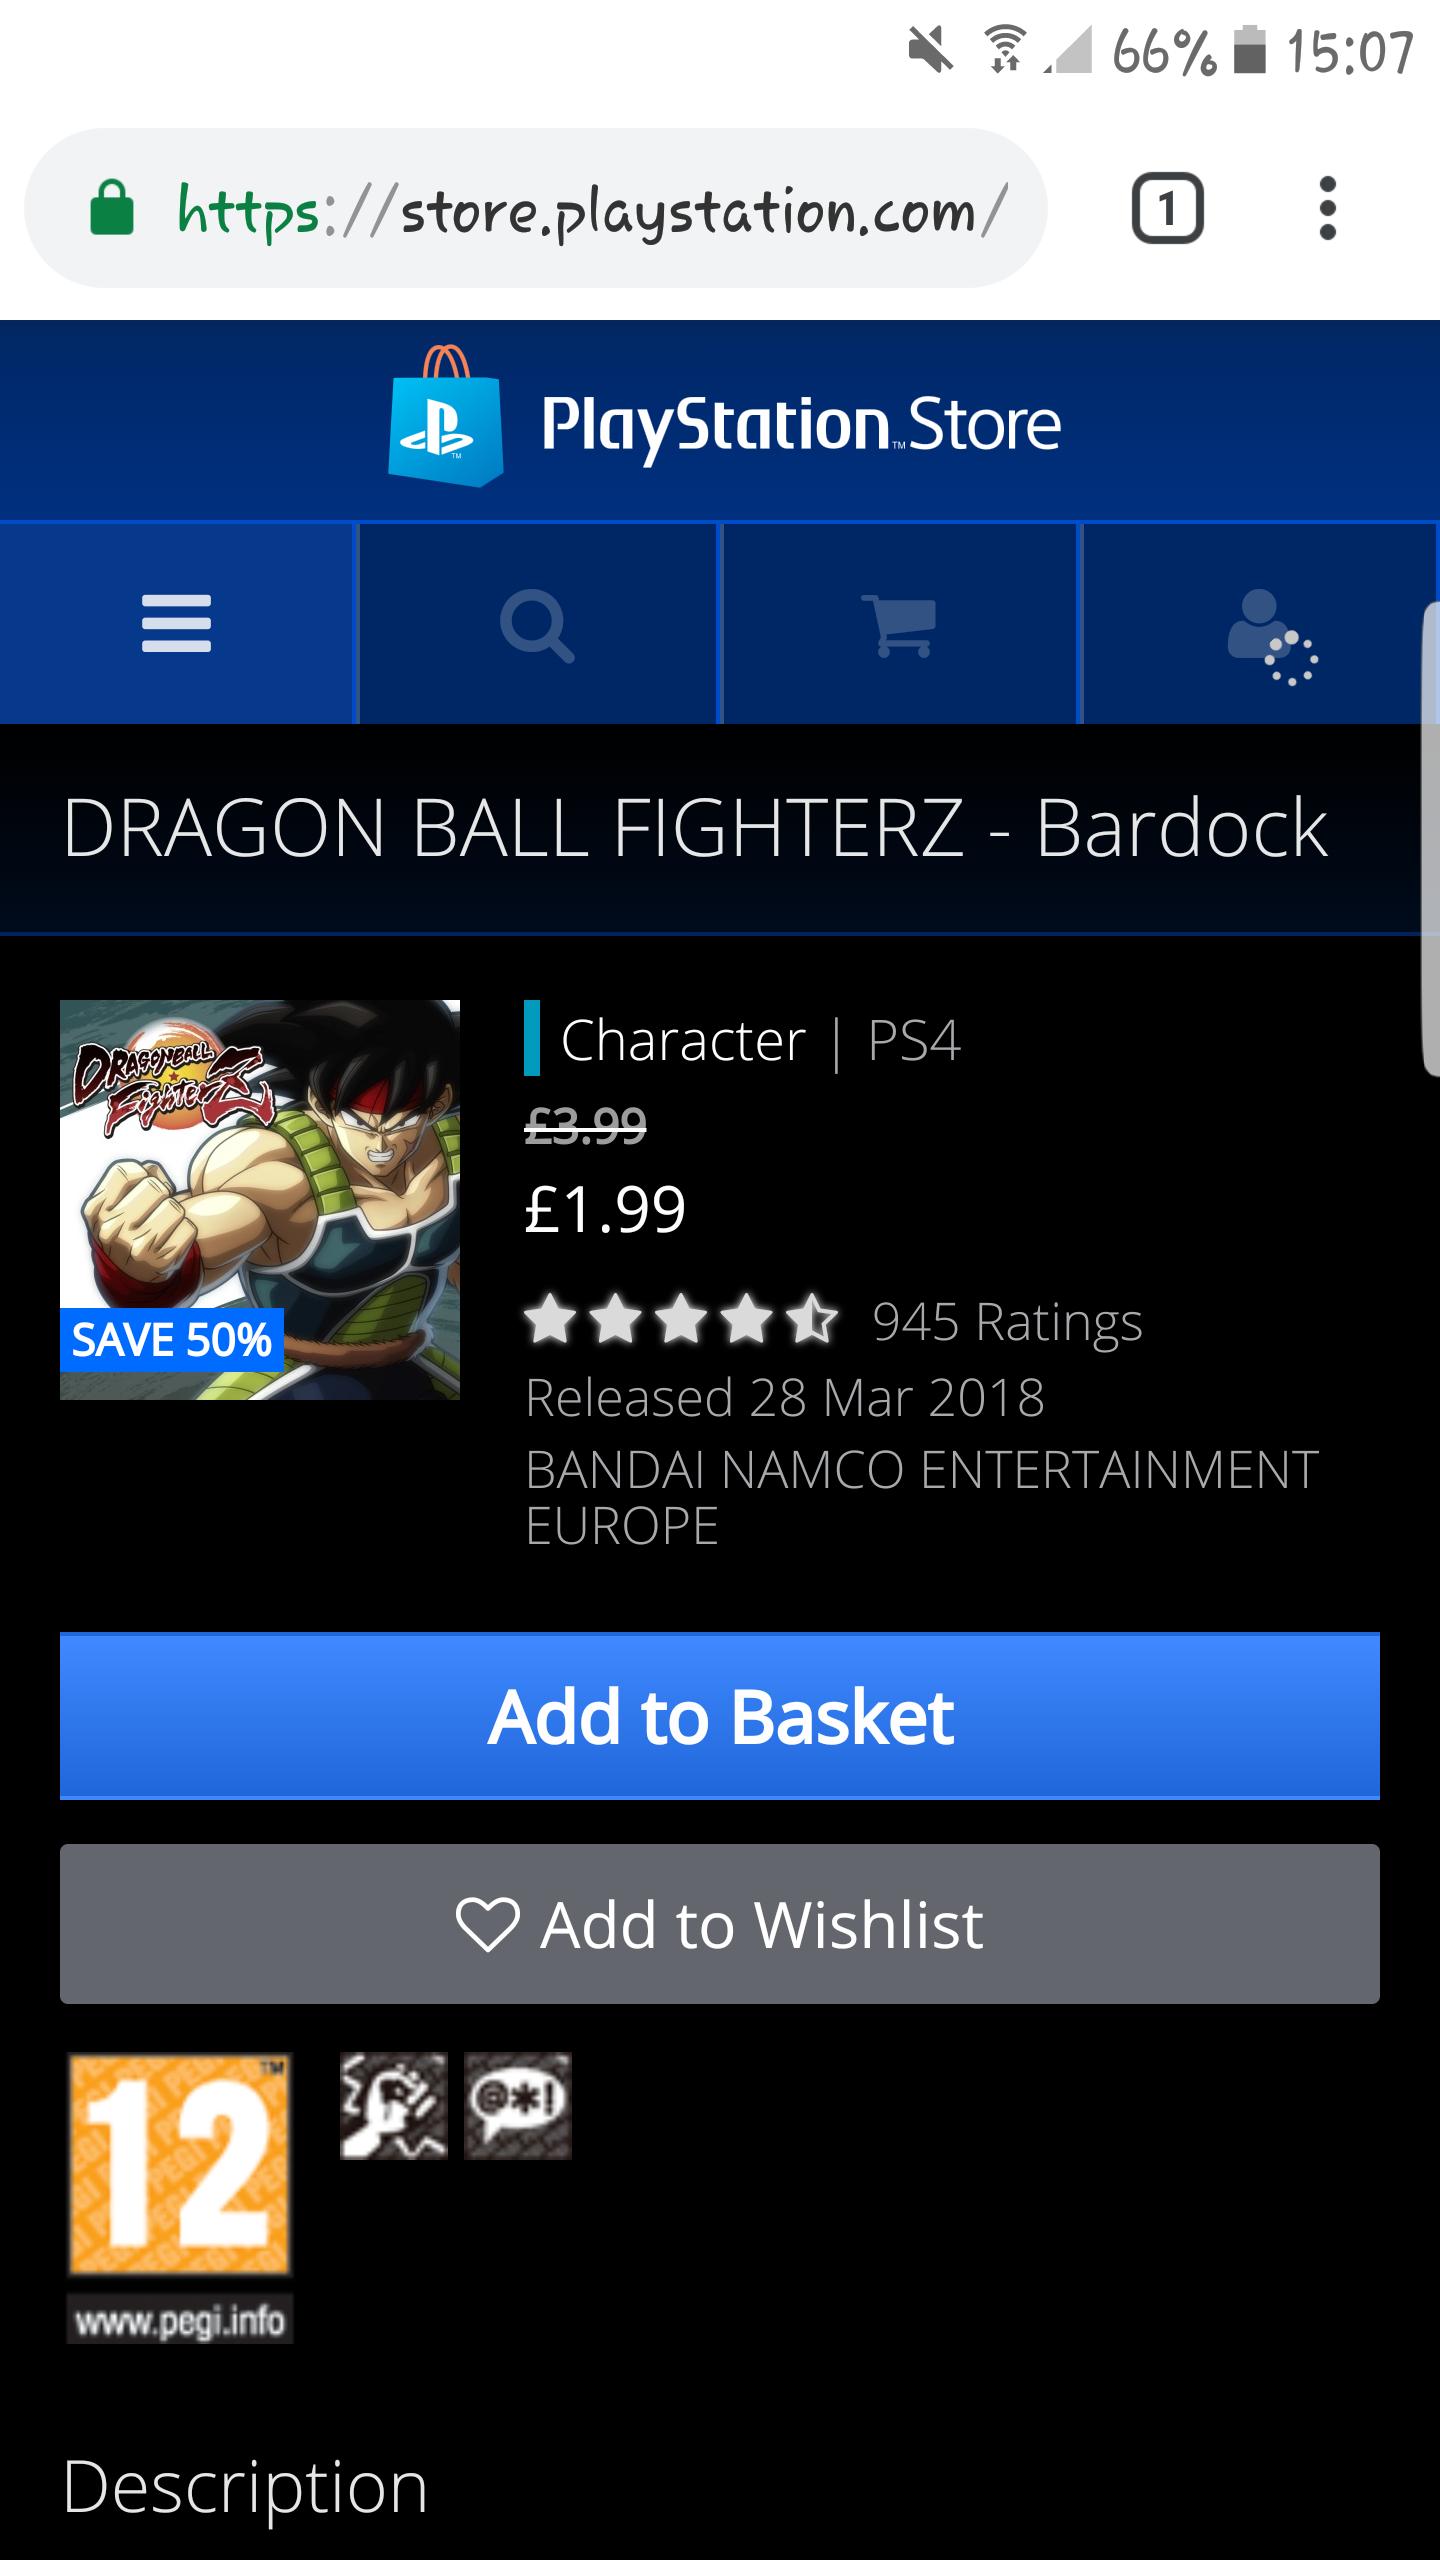 Dragon Ball FighterZ DLC Half Price Selected Characters (Broly, Bardock, Vegito and Zamasu) £1.99 @ PSN